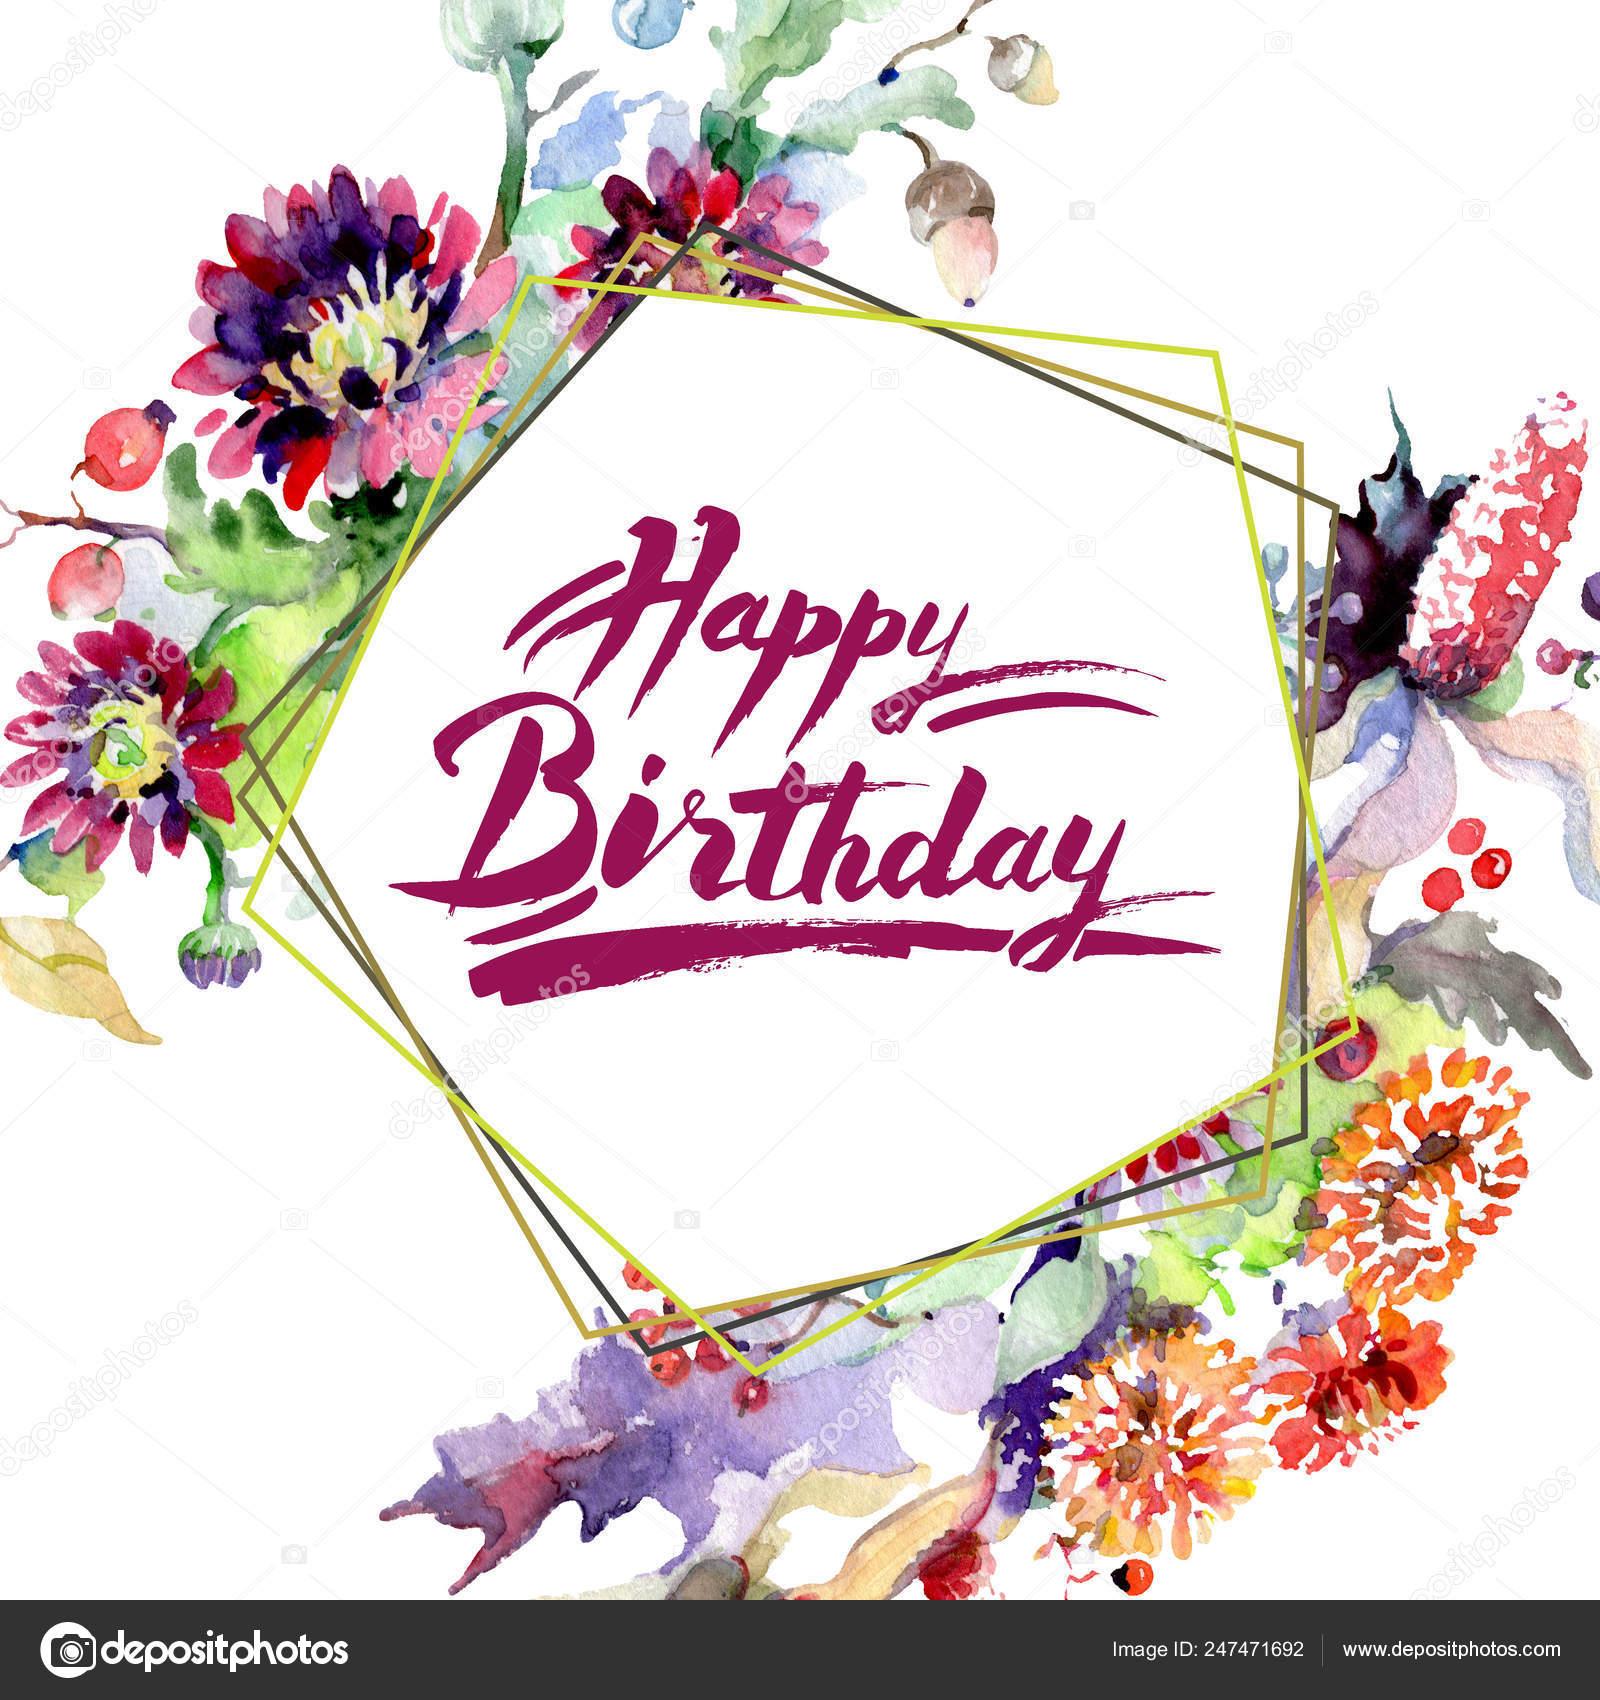 Happy Birthday Flowers Pictures Images Stock Photos Depositphotos